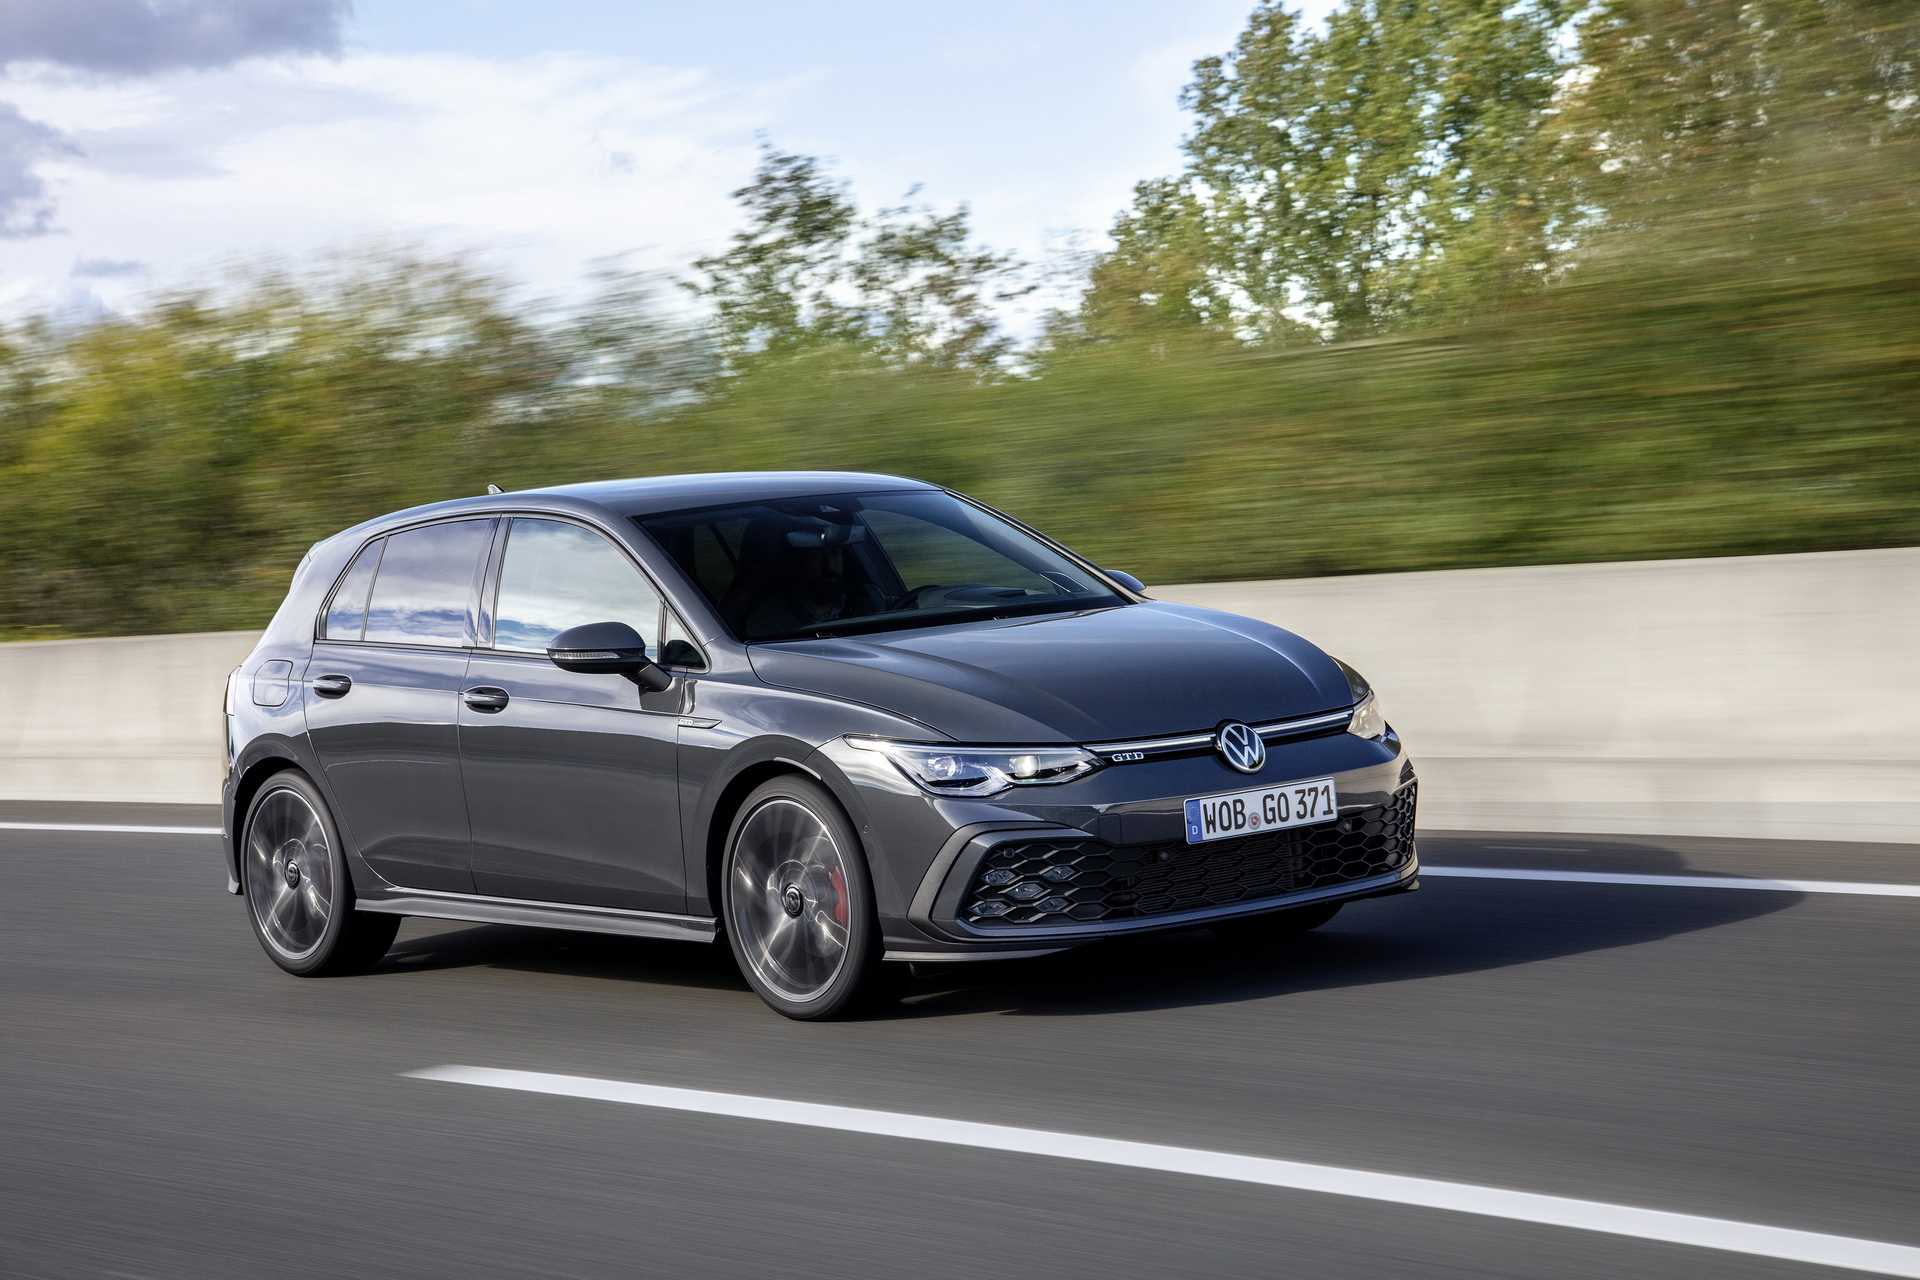 2021 Volkswagen Golf GTD Diesel UK Pricing Revealed, Delivers 197 HP